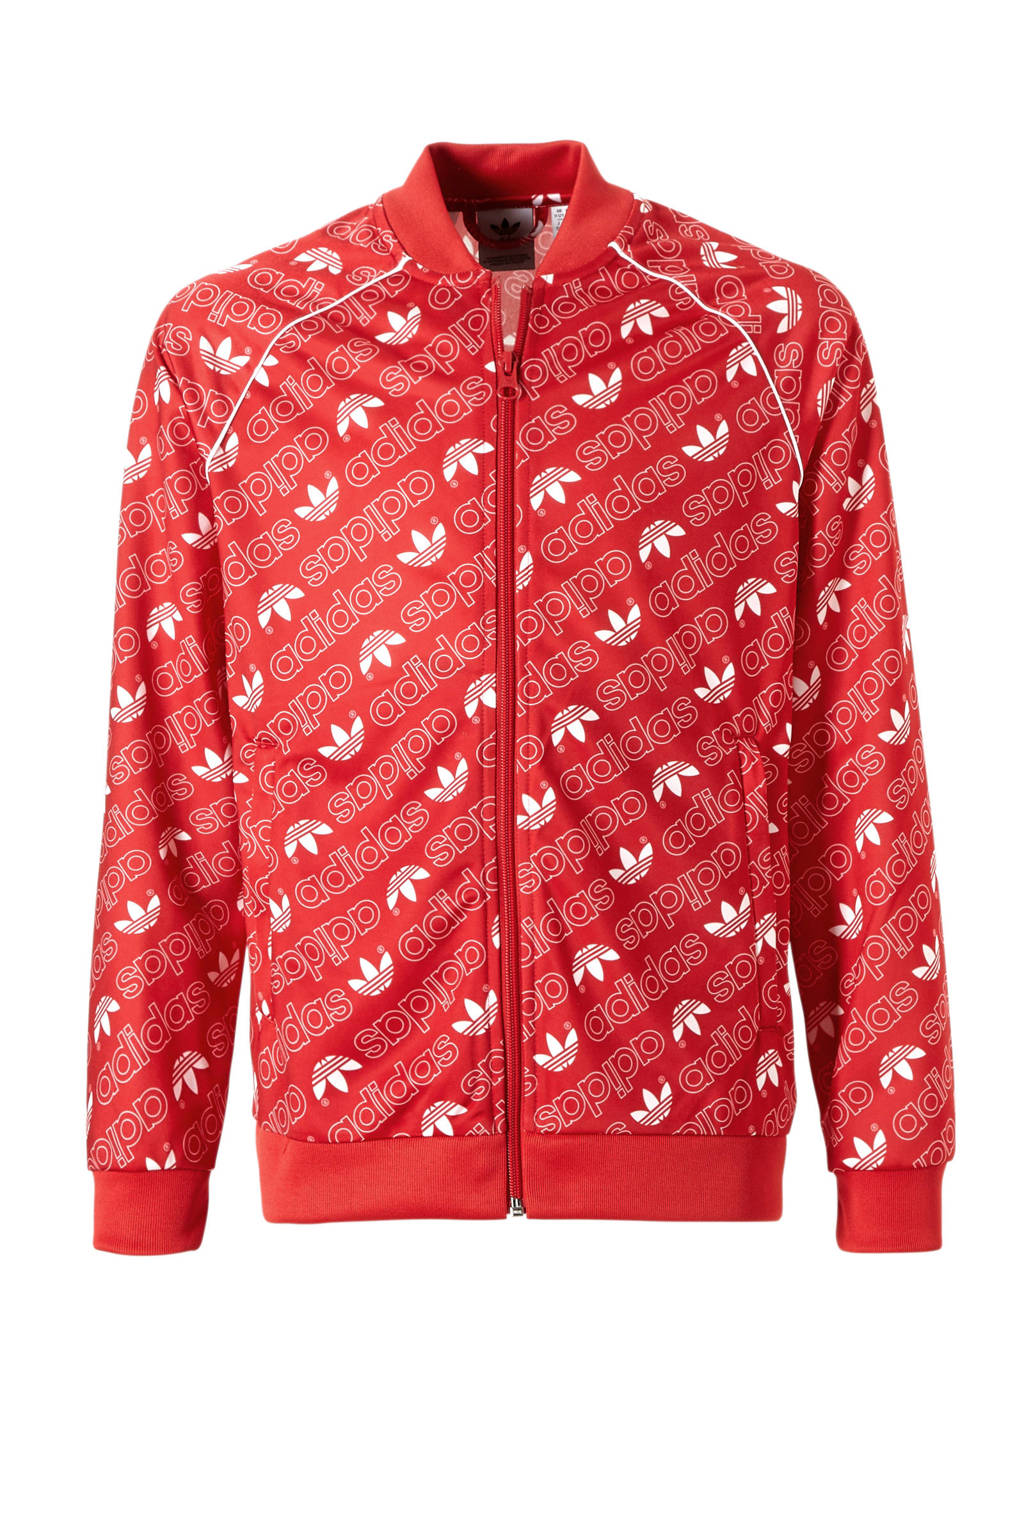 adidas originals   vest, Rood/wit